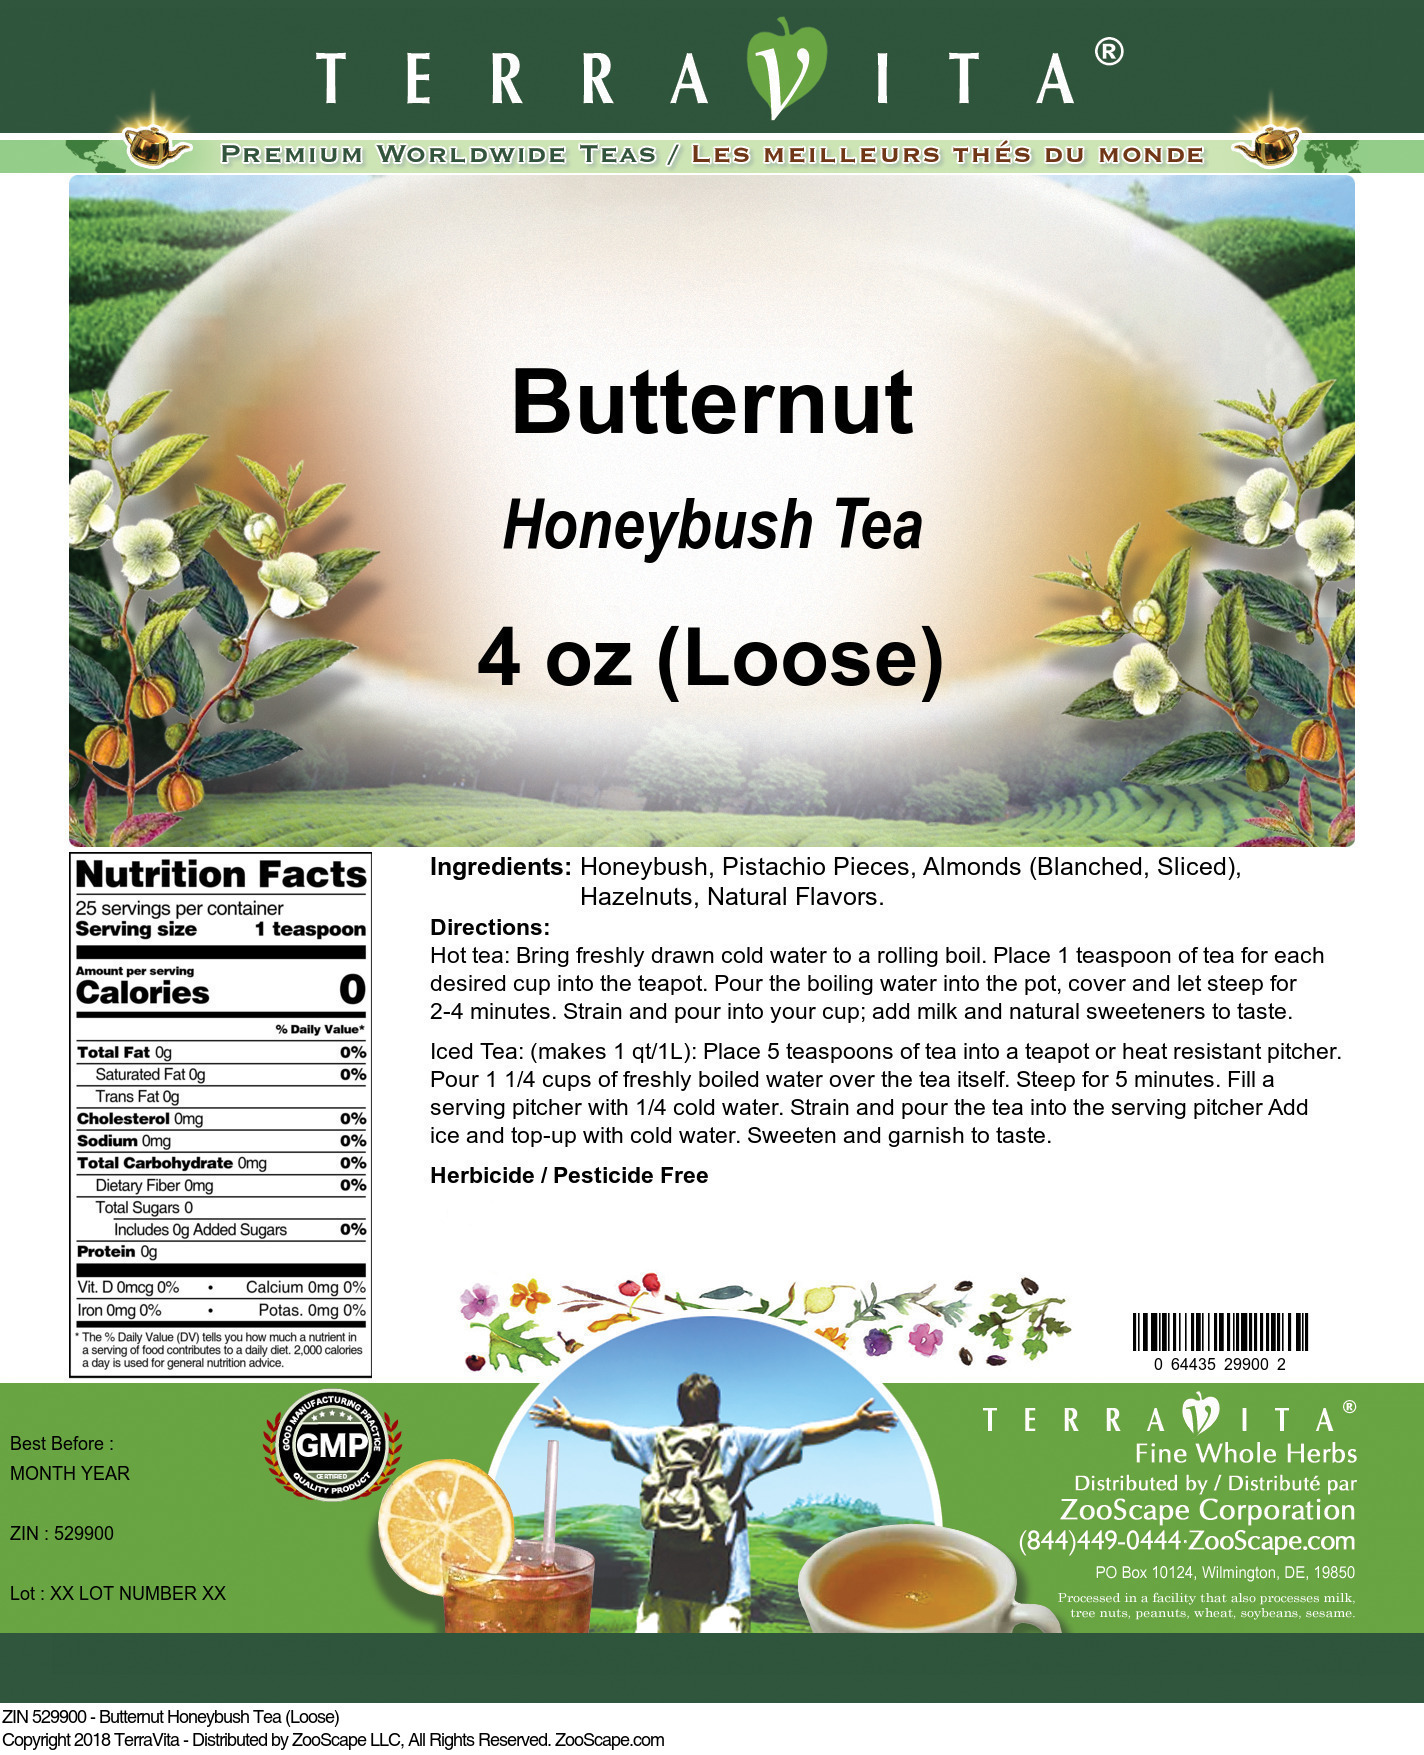 Butternut Honeybush Tea (Loose)